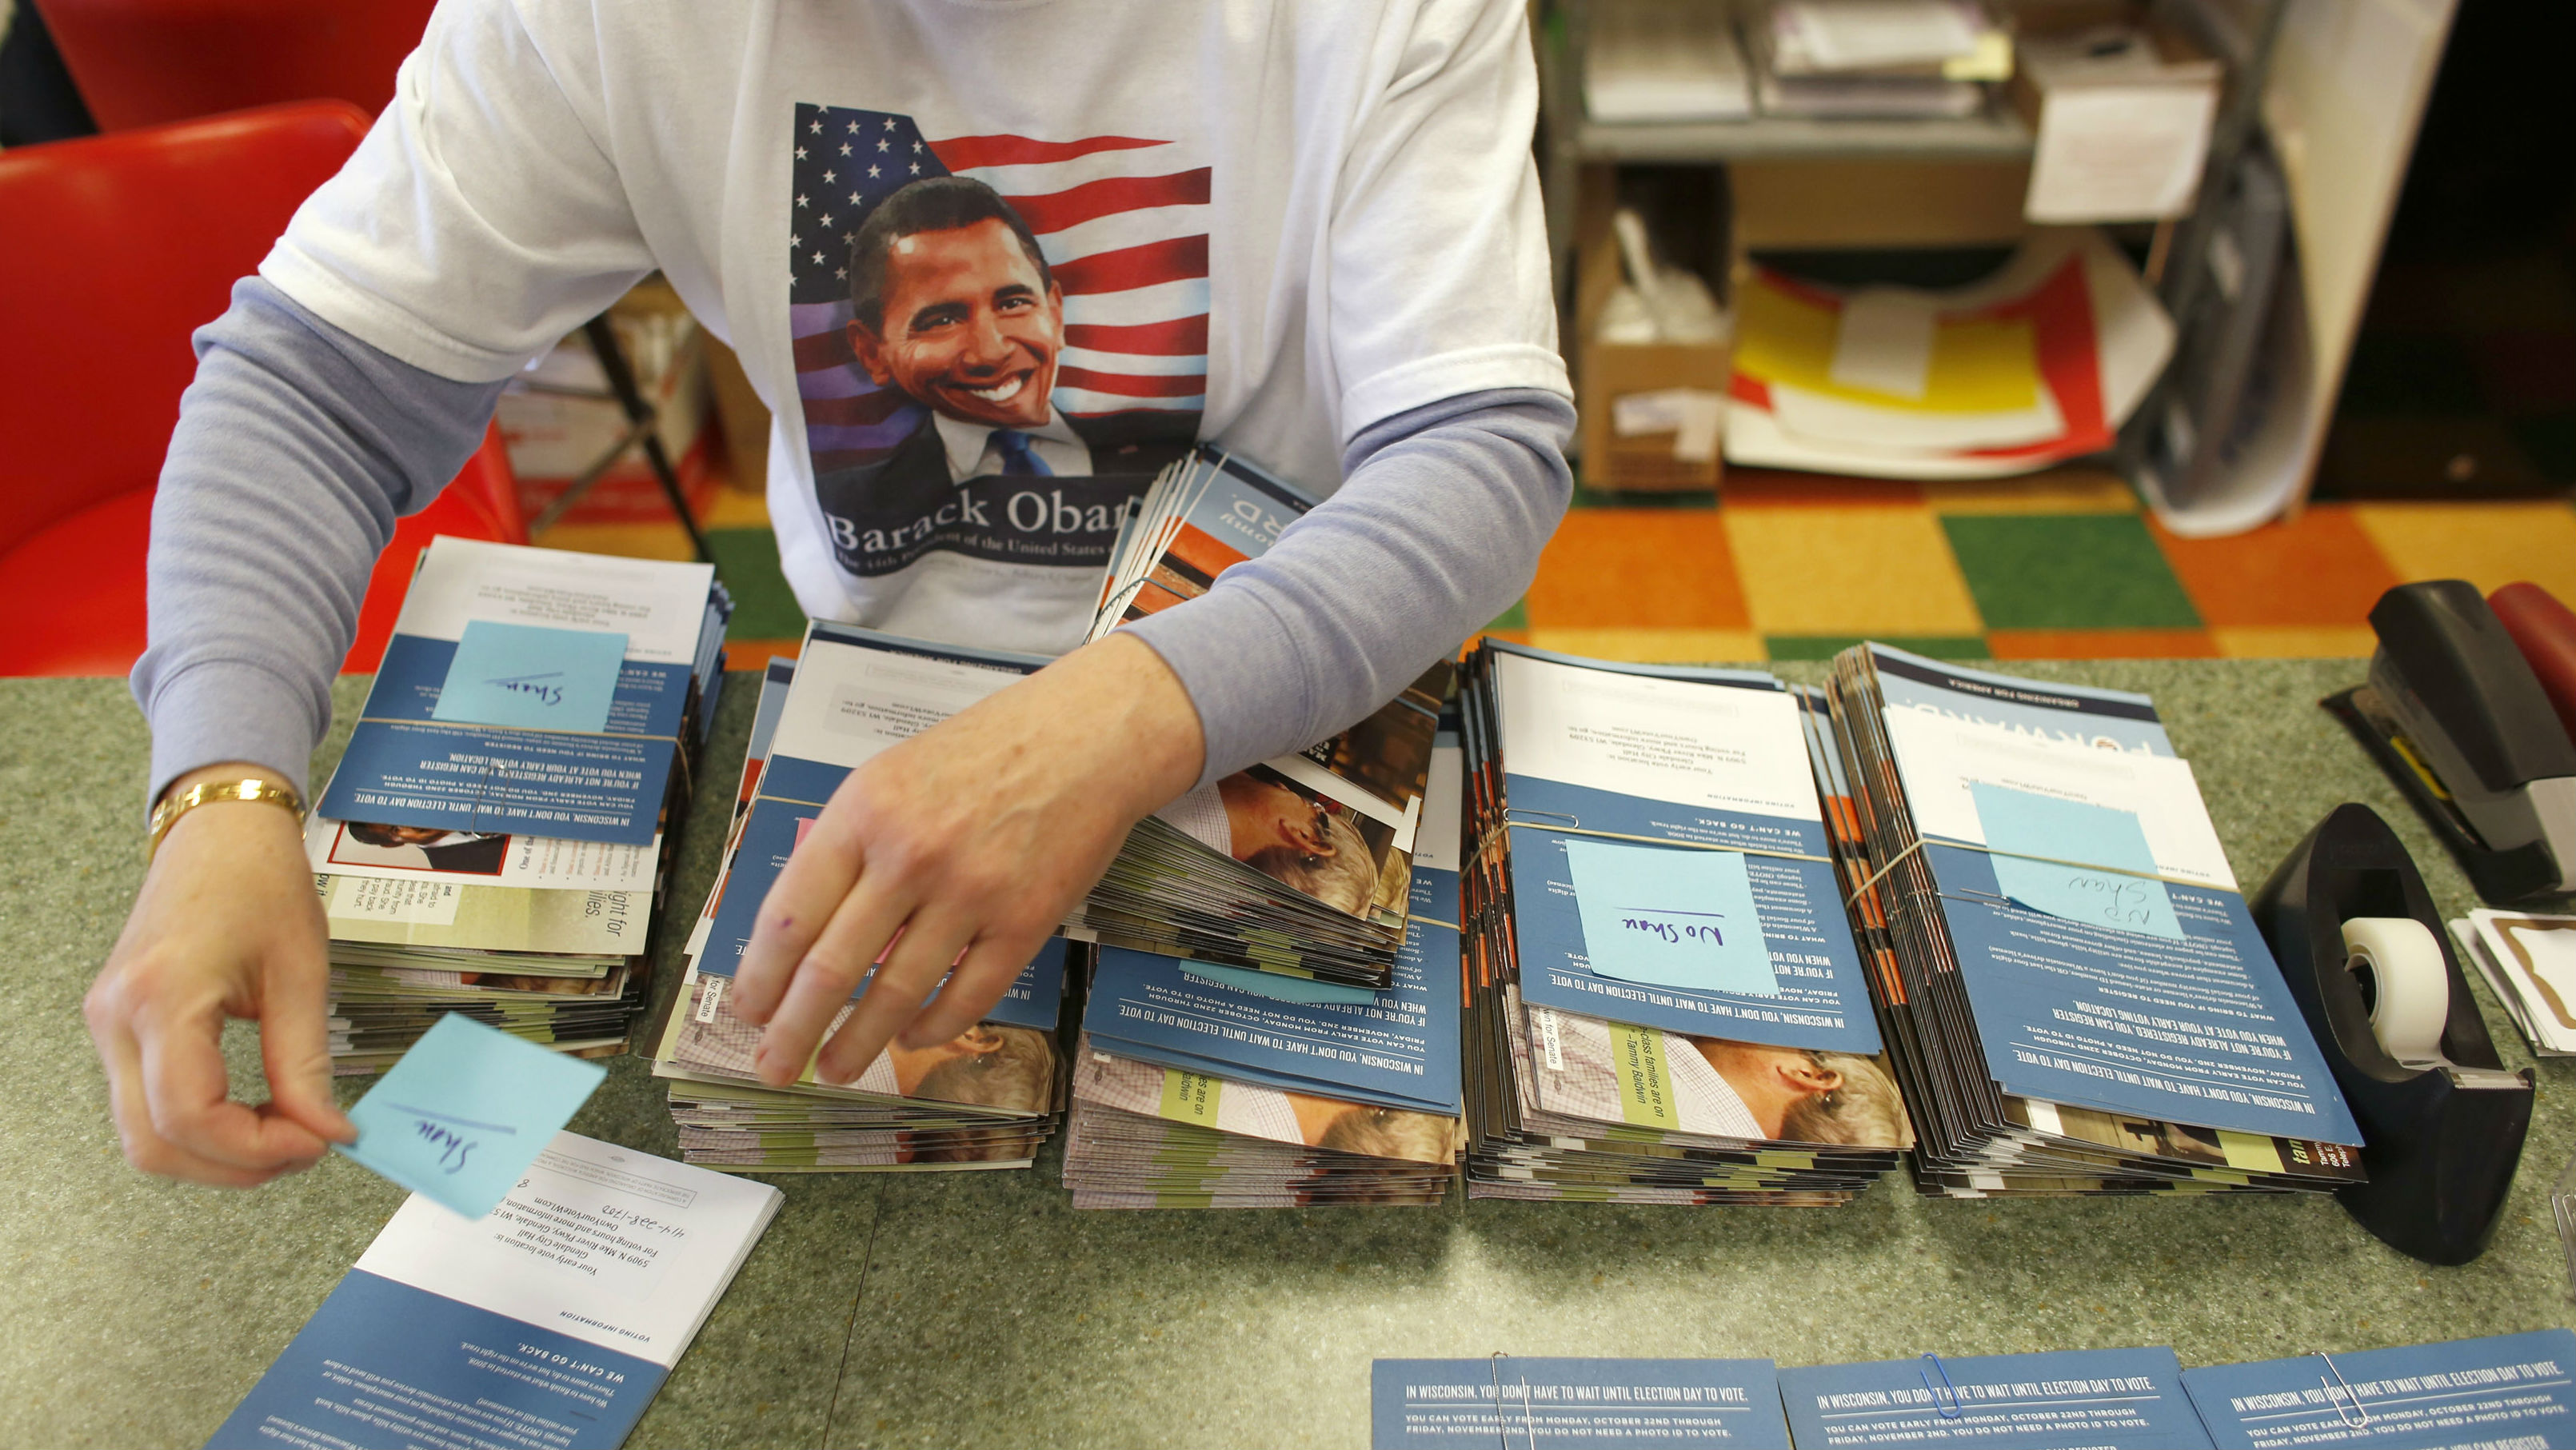 Obama volunteers (getty)